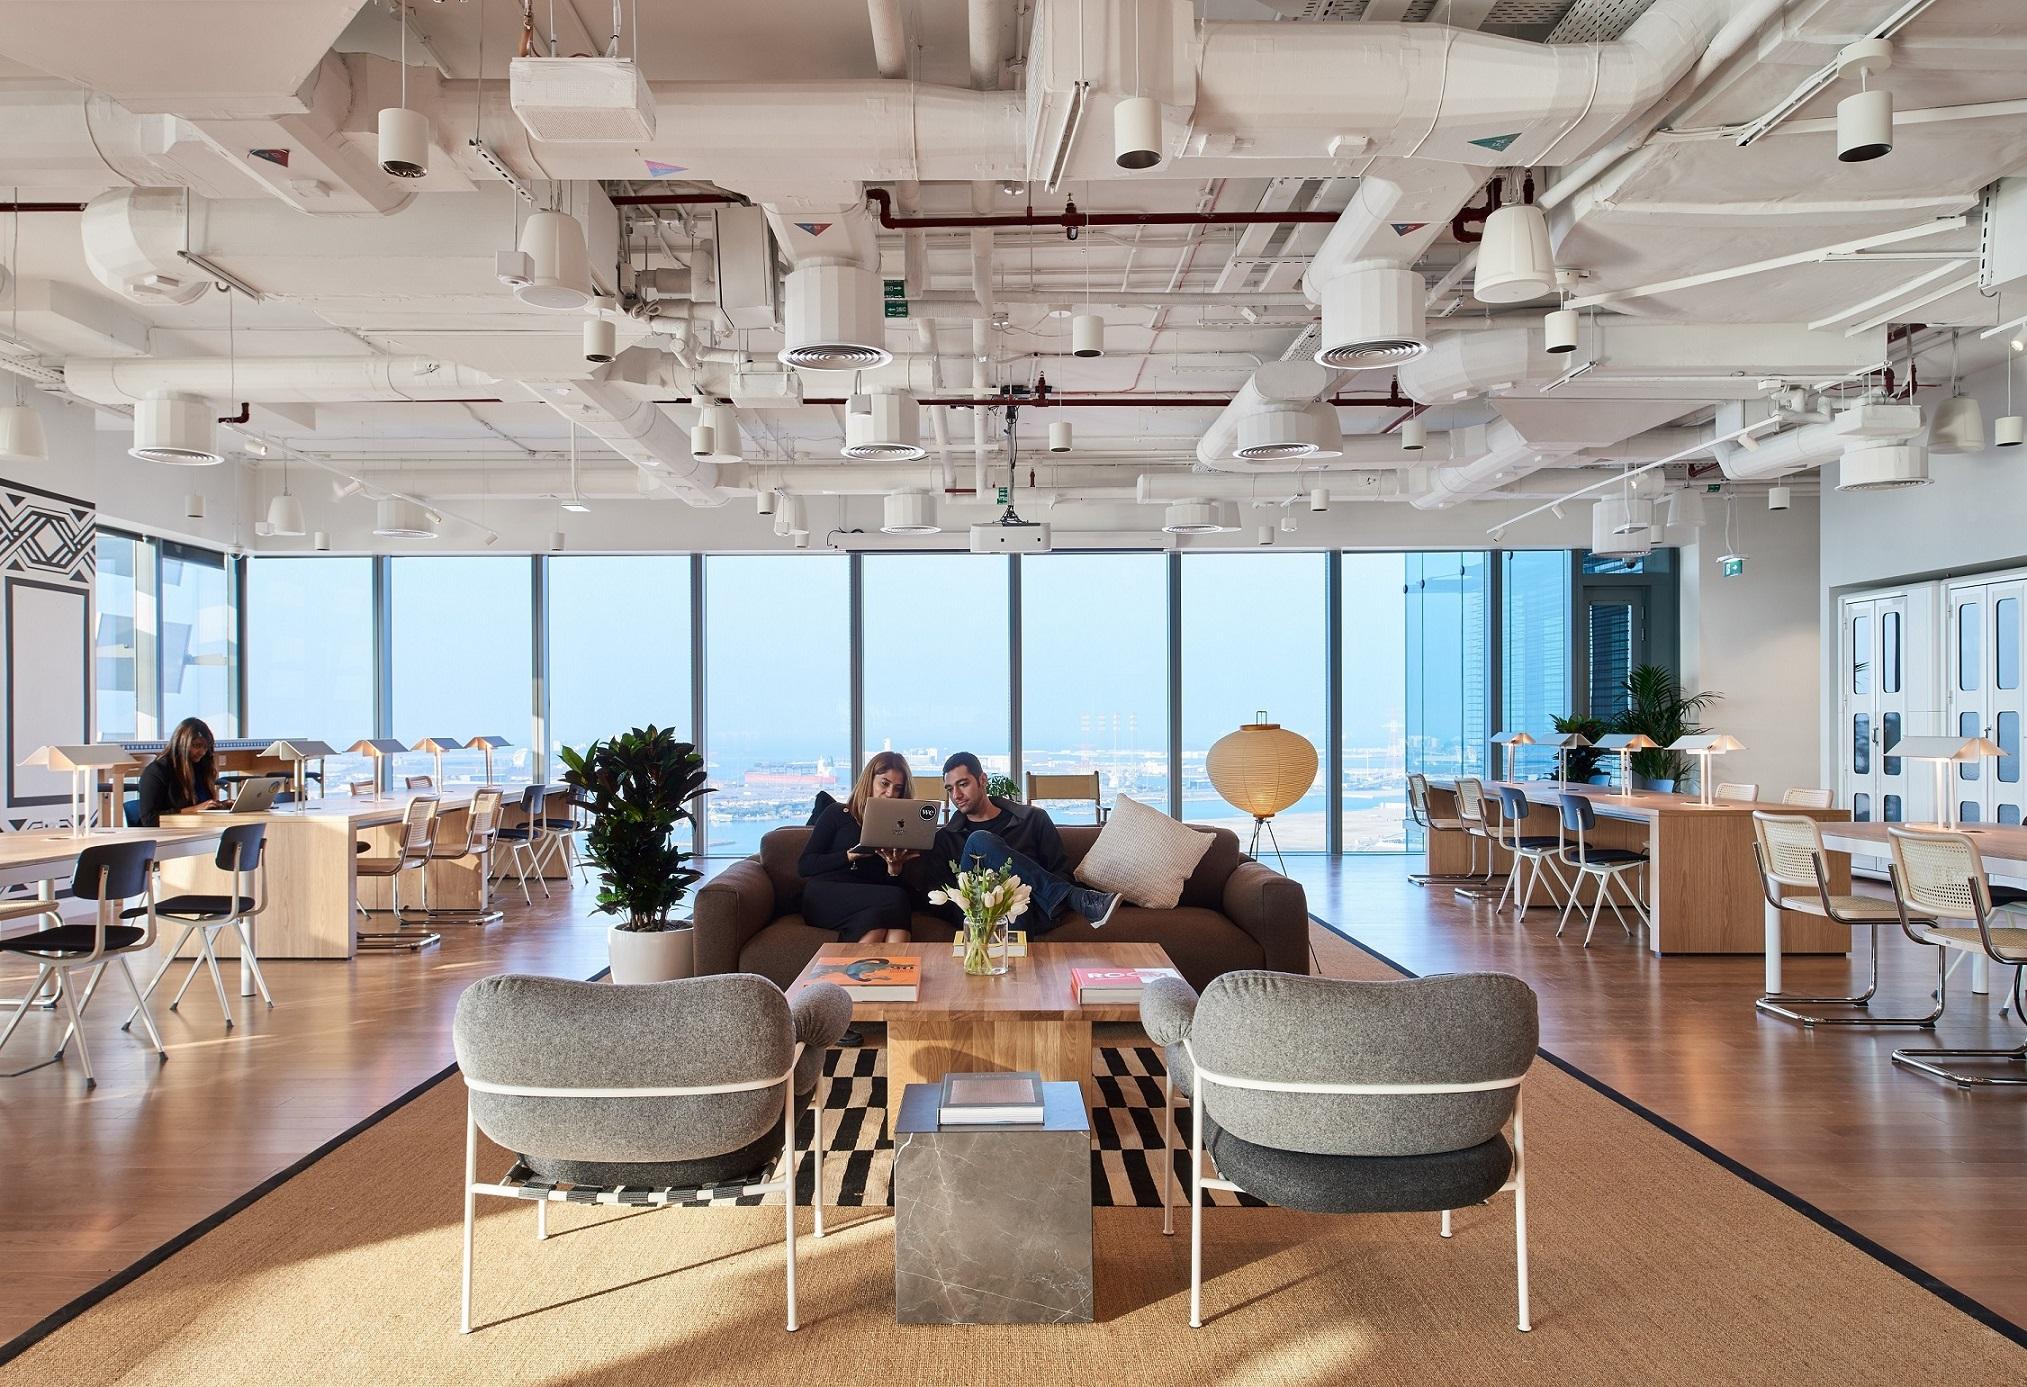 Hub71 selected to endorse global tech entrepreneurs for Golden Visas in Abu Dhabi